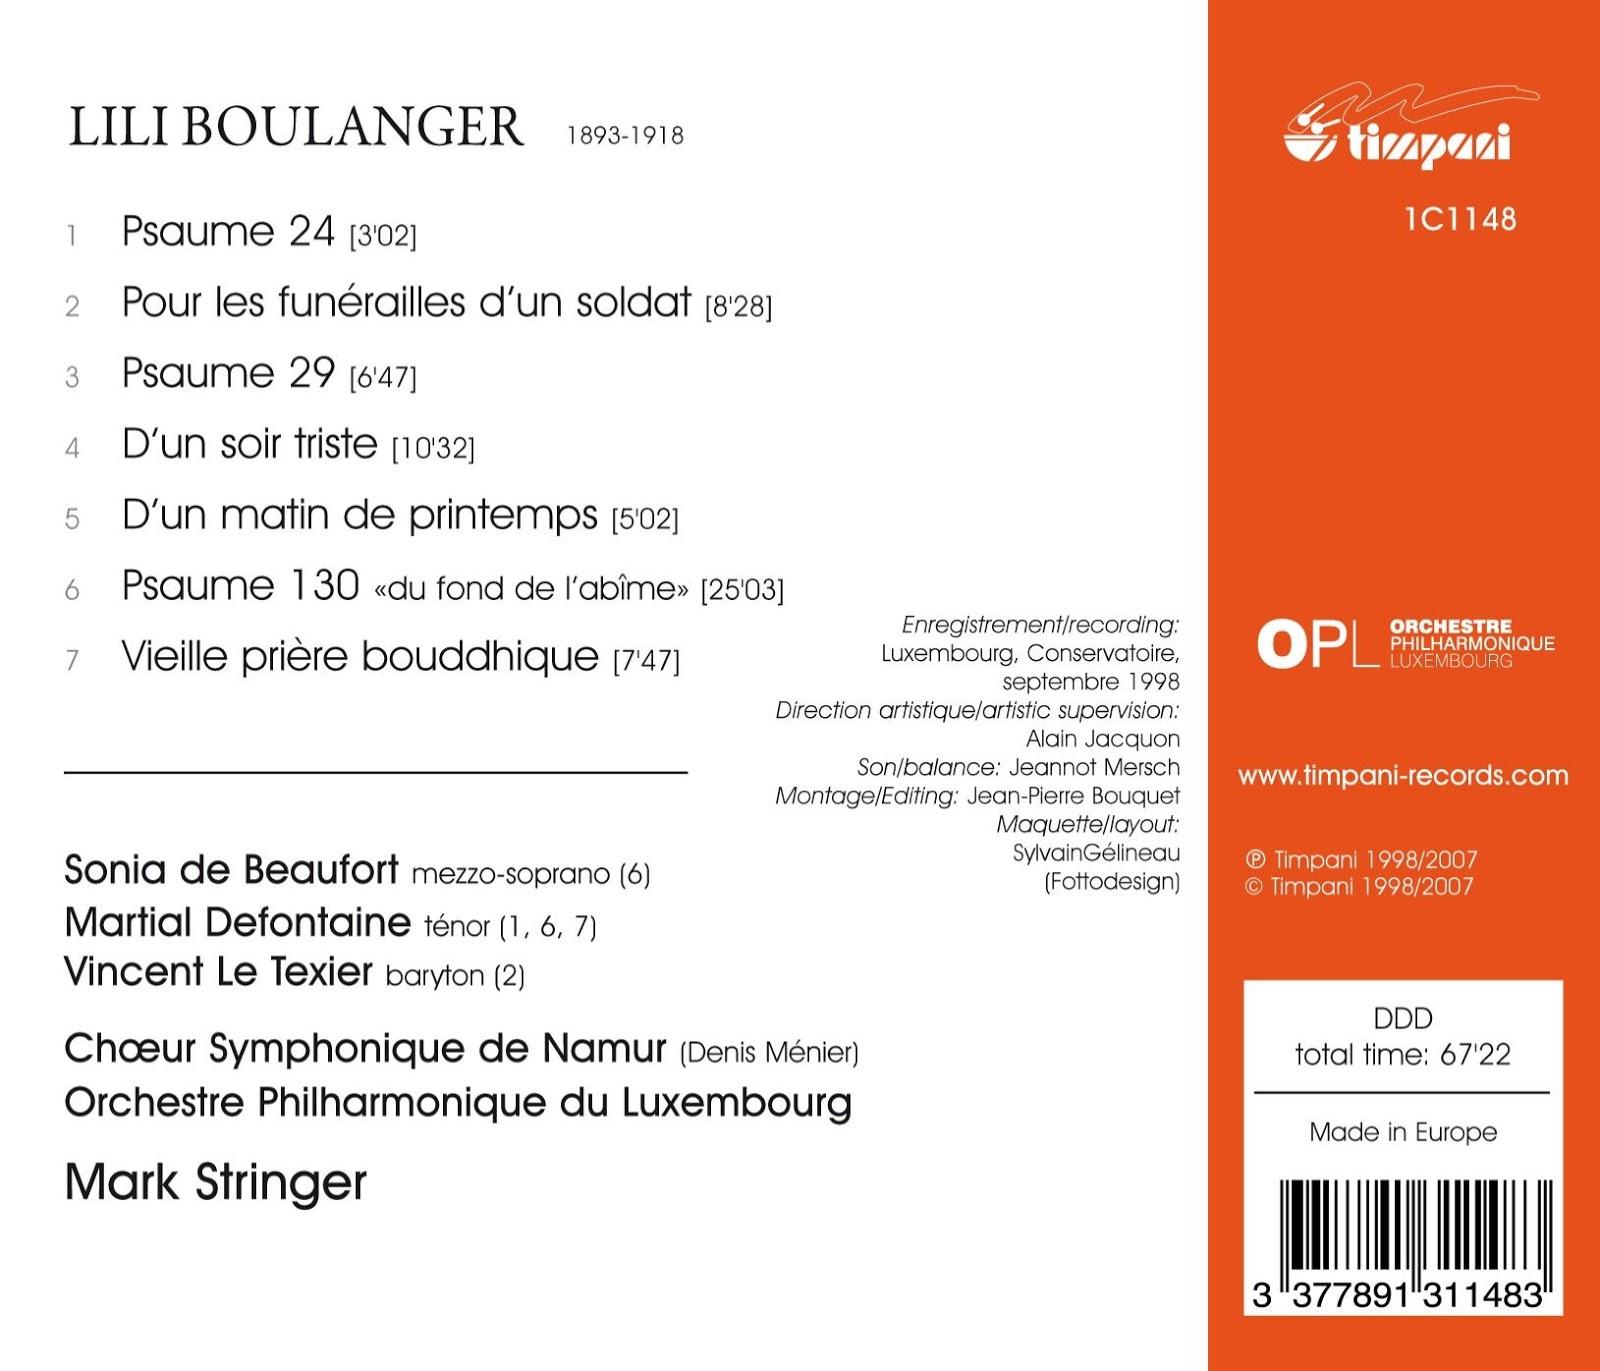 Magical Journey: Lili Boulanger - Psaumes 24, 129 & 130